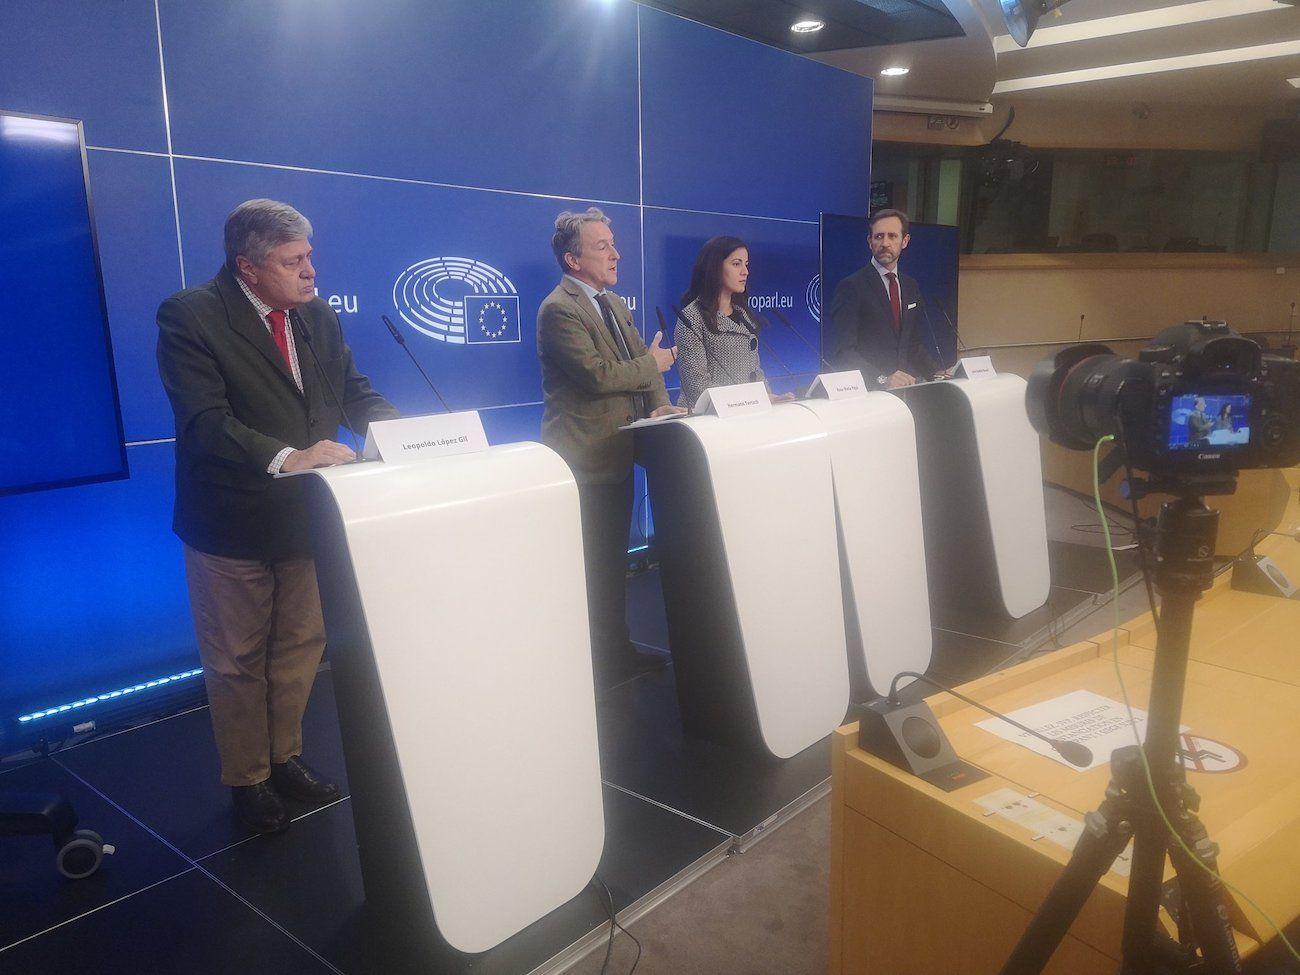 De izquierda a derecha, Leopoldo Lopez Gil (EPP), Hermann Tertsch (ECR), Rosa Maria Paya, promotora de Cuba Decide, y Jose Ramon Bauza (Renew Europe).